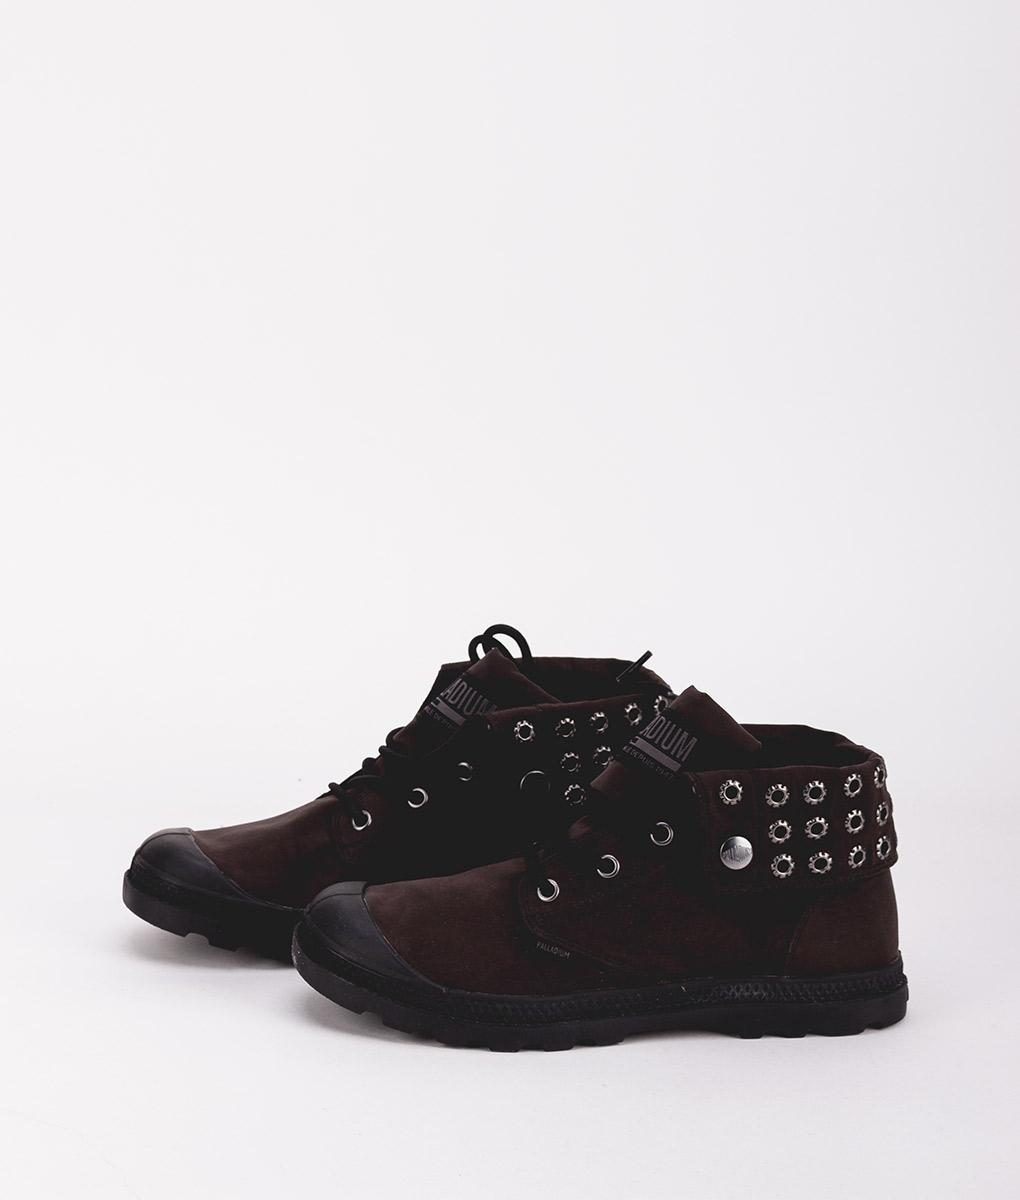 PALLADIUM Women Sneakers 95693 BAGGY LOW LP SUPPLY, Black 74.99